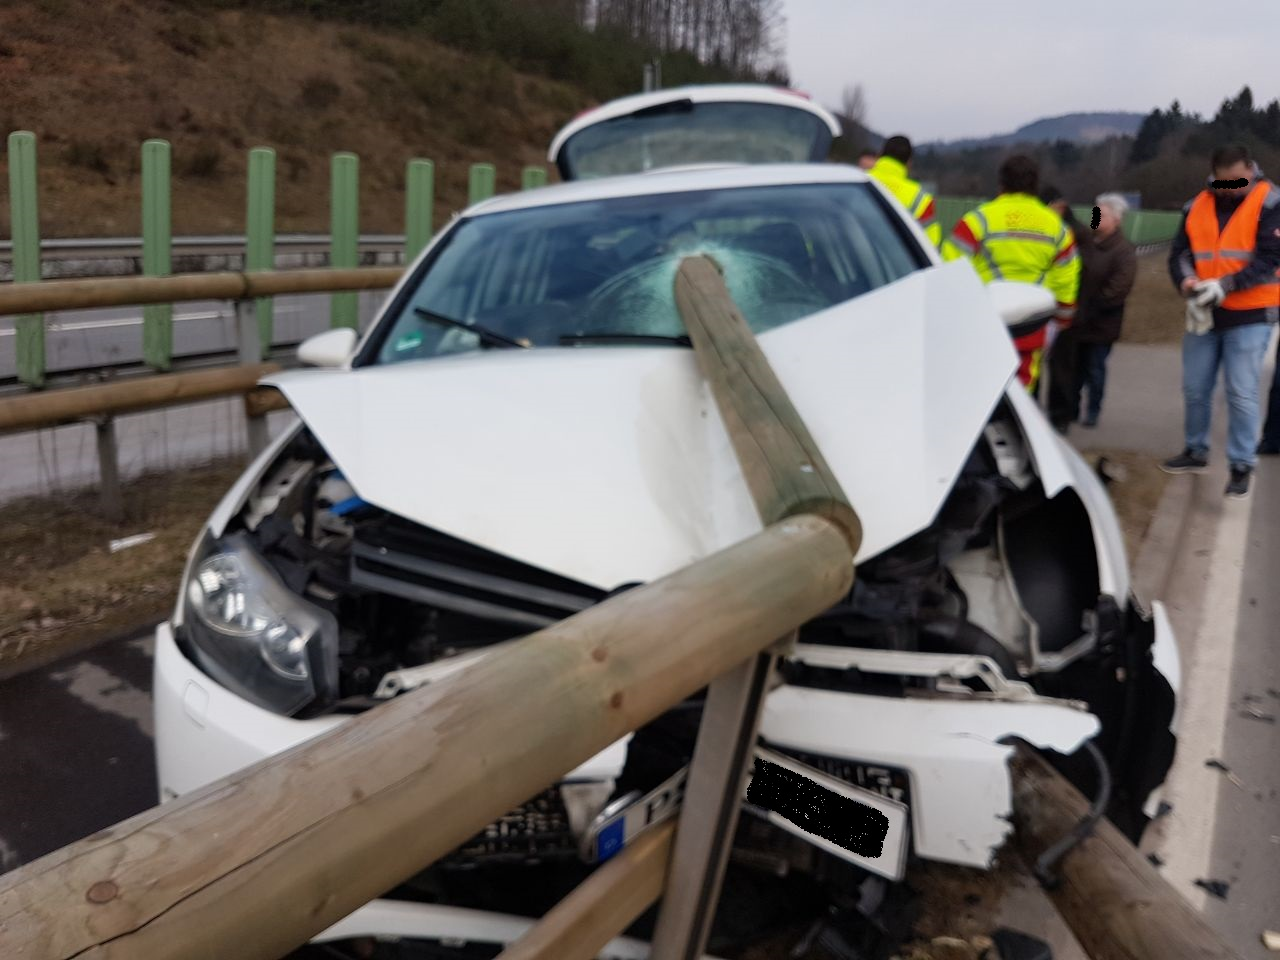 POL-PDPS: Münchweiler / Unfall mit Folgen - Verursacher flüchtet ...